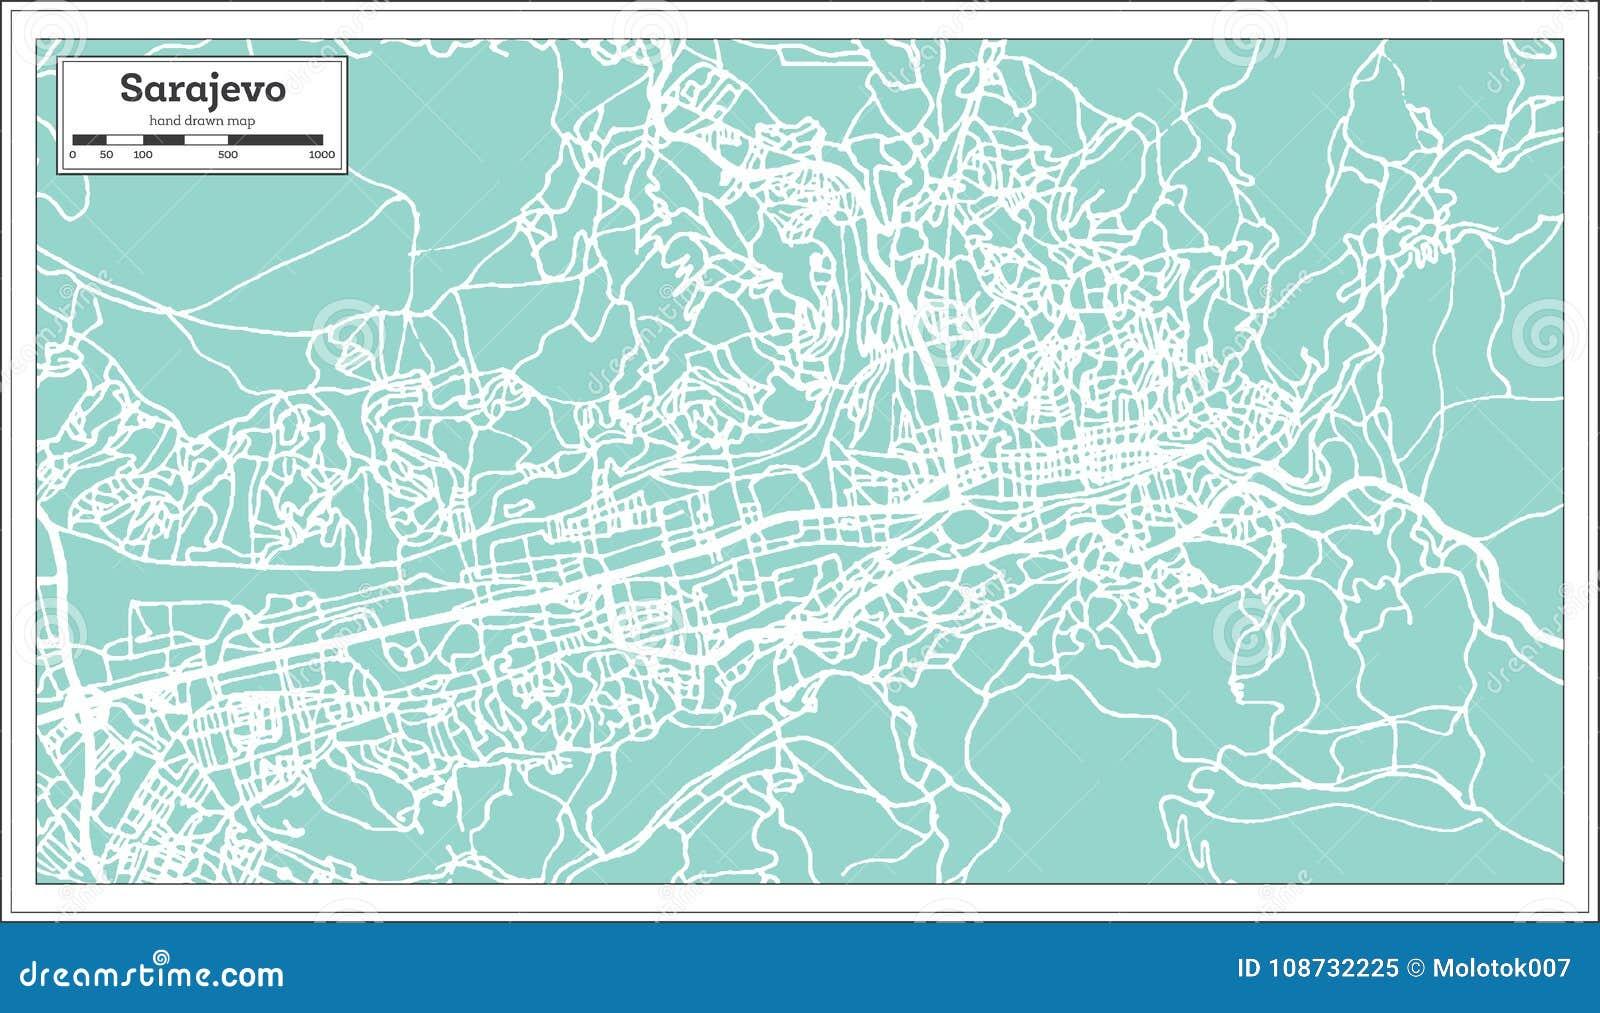 Sarajevo Bosnia And Herzegovina City Map In Retro Style ... on amsterdam netherlands map, pristina kosovo map, surviving the killshot map, vladivostok russia map, bosnia and herzegovina map, slovenia bosnia map, damascus syria map, bosnia location on map, livno bosnia map, bratislava slovakia map, syrian land use map, blagaj bosnia map, ww1 map, zurich switzerland map, europe bosnia map, stockholm bosnia map, lukavac bosnia map, tirana albania map, bosnia genocide map, bosnia on world map,